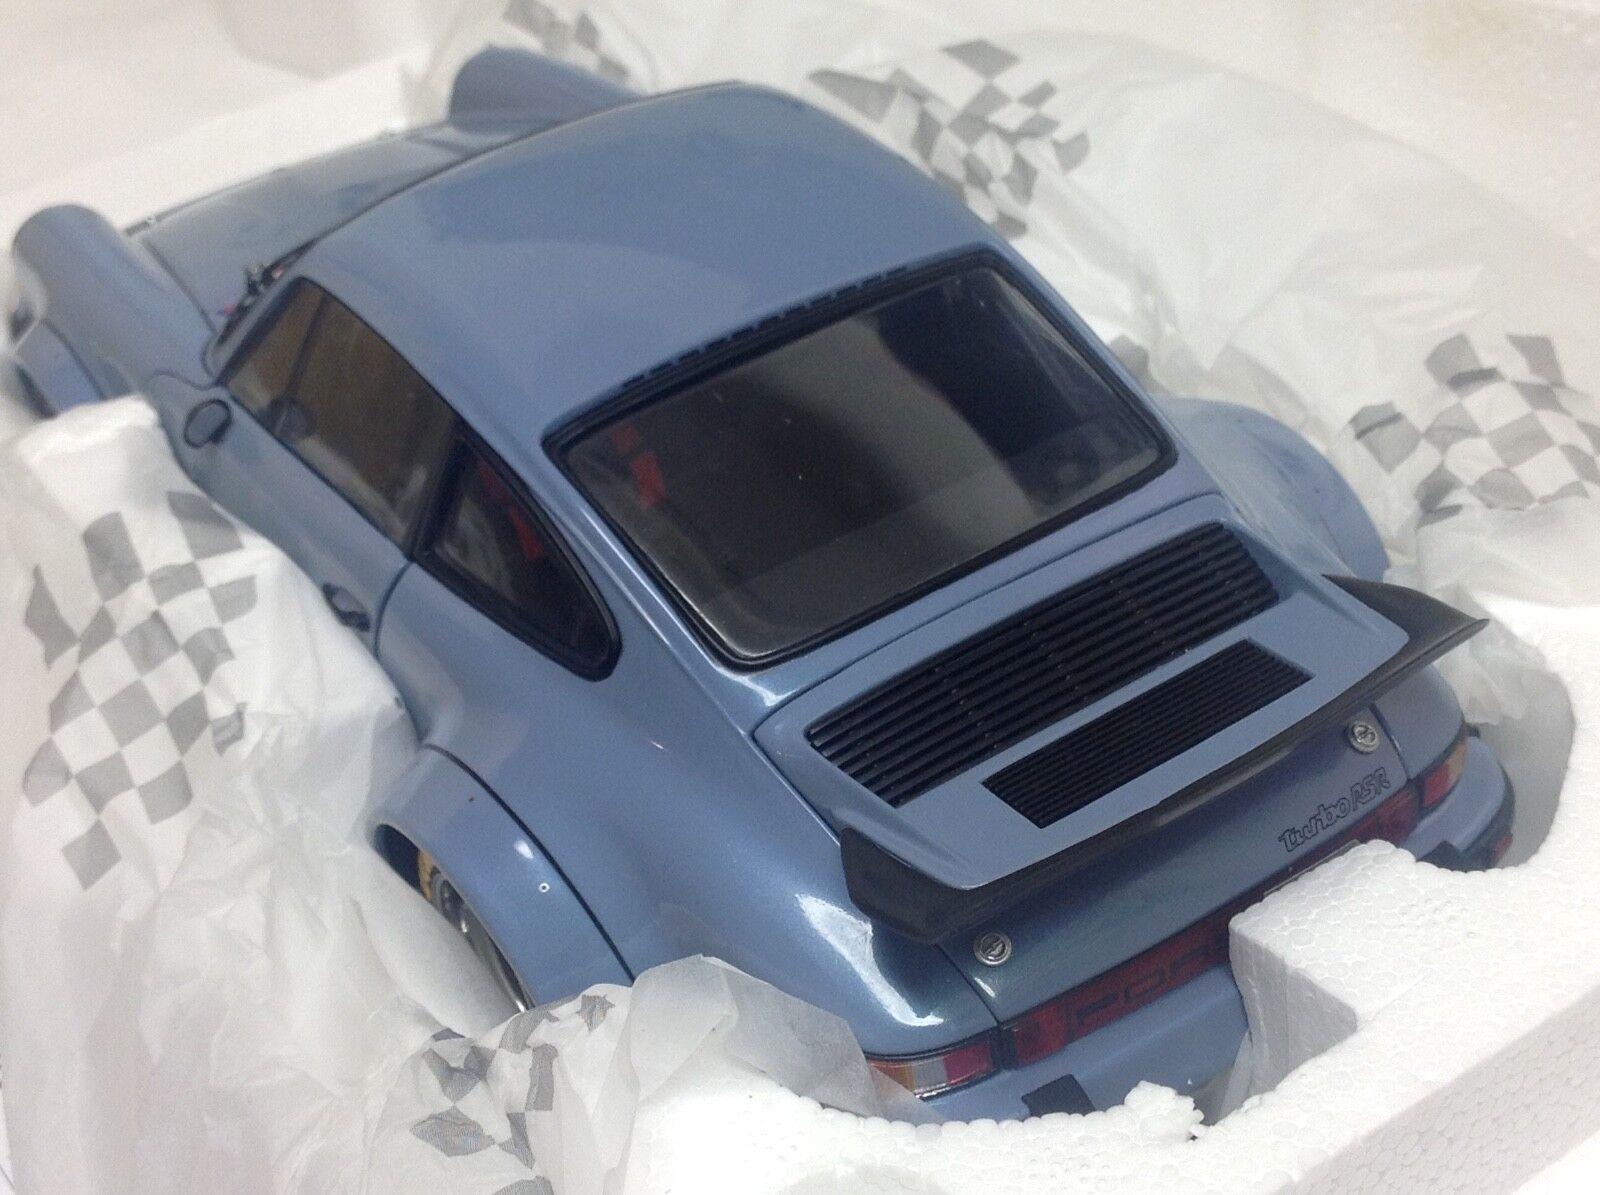 Exoto Porsche 934 rsr turbo Street laguna seca Sky Standox 1 18 nuevo 00040 911